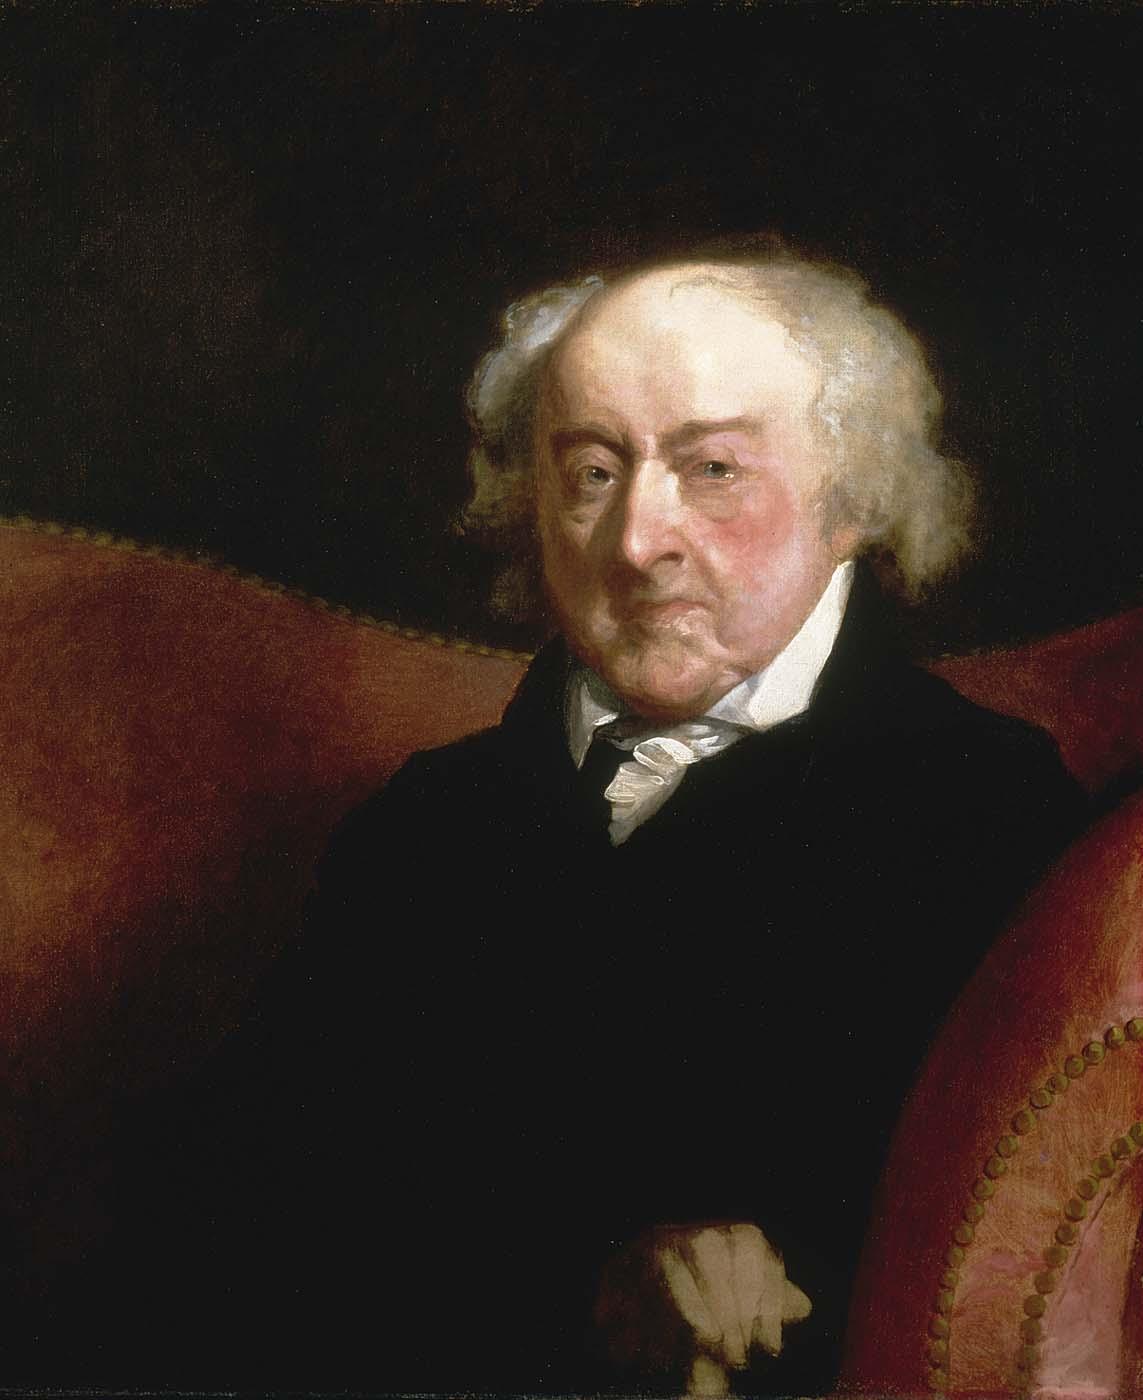 John Adams, 1826, Gilbert Stuart, Smithsonian American Art Museum